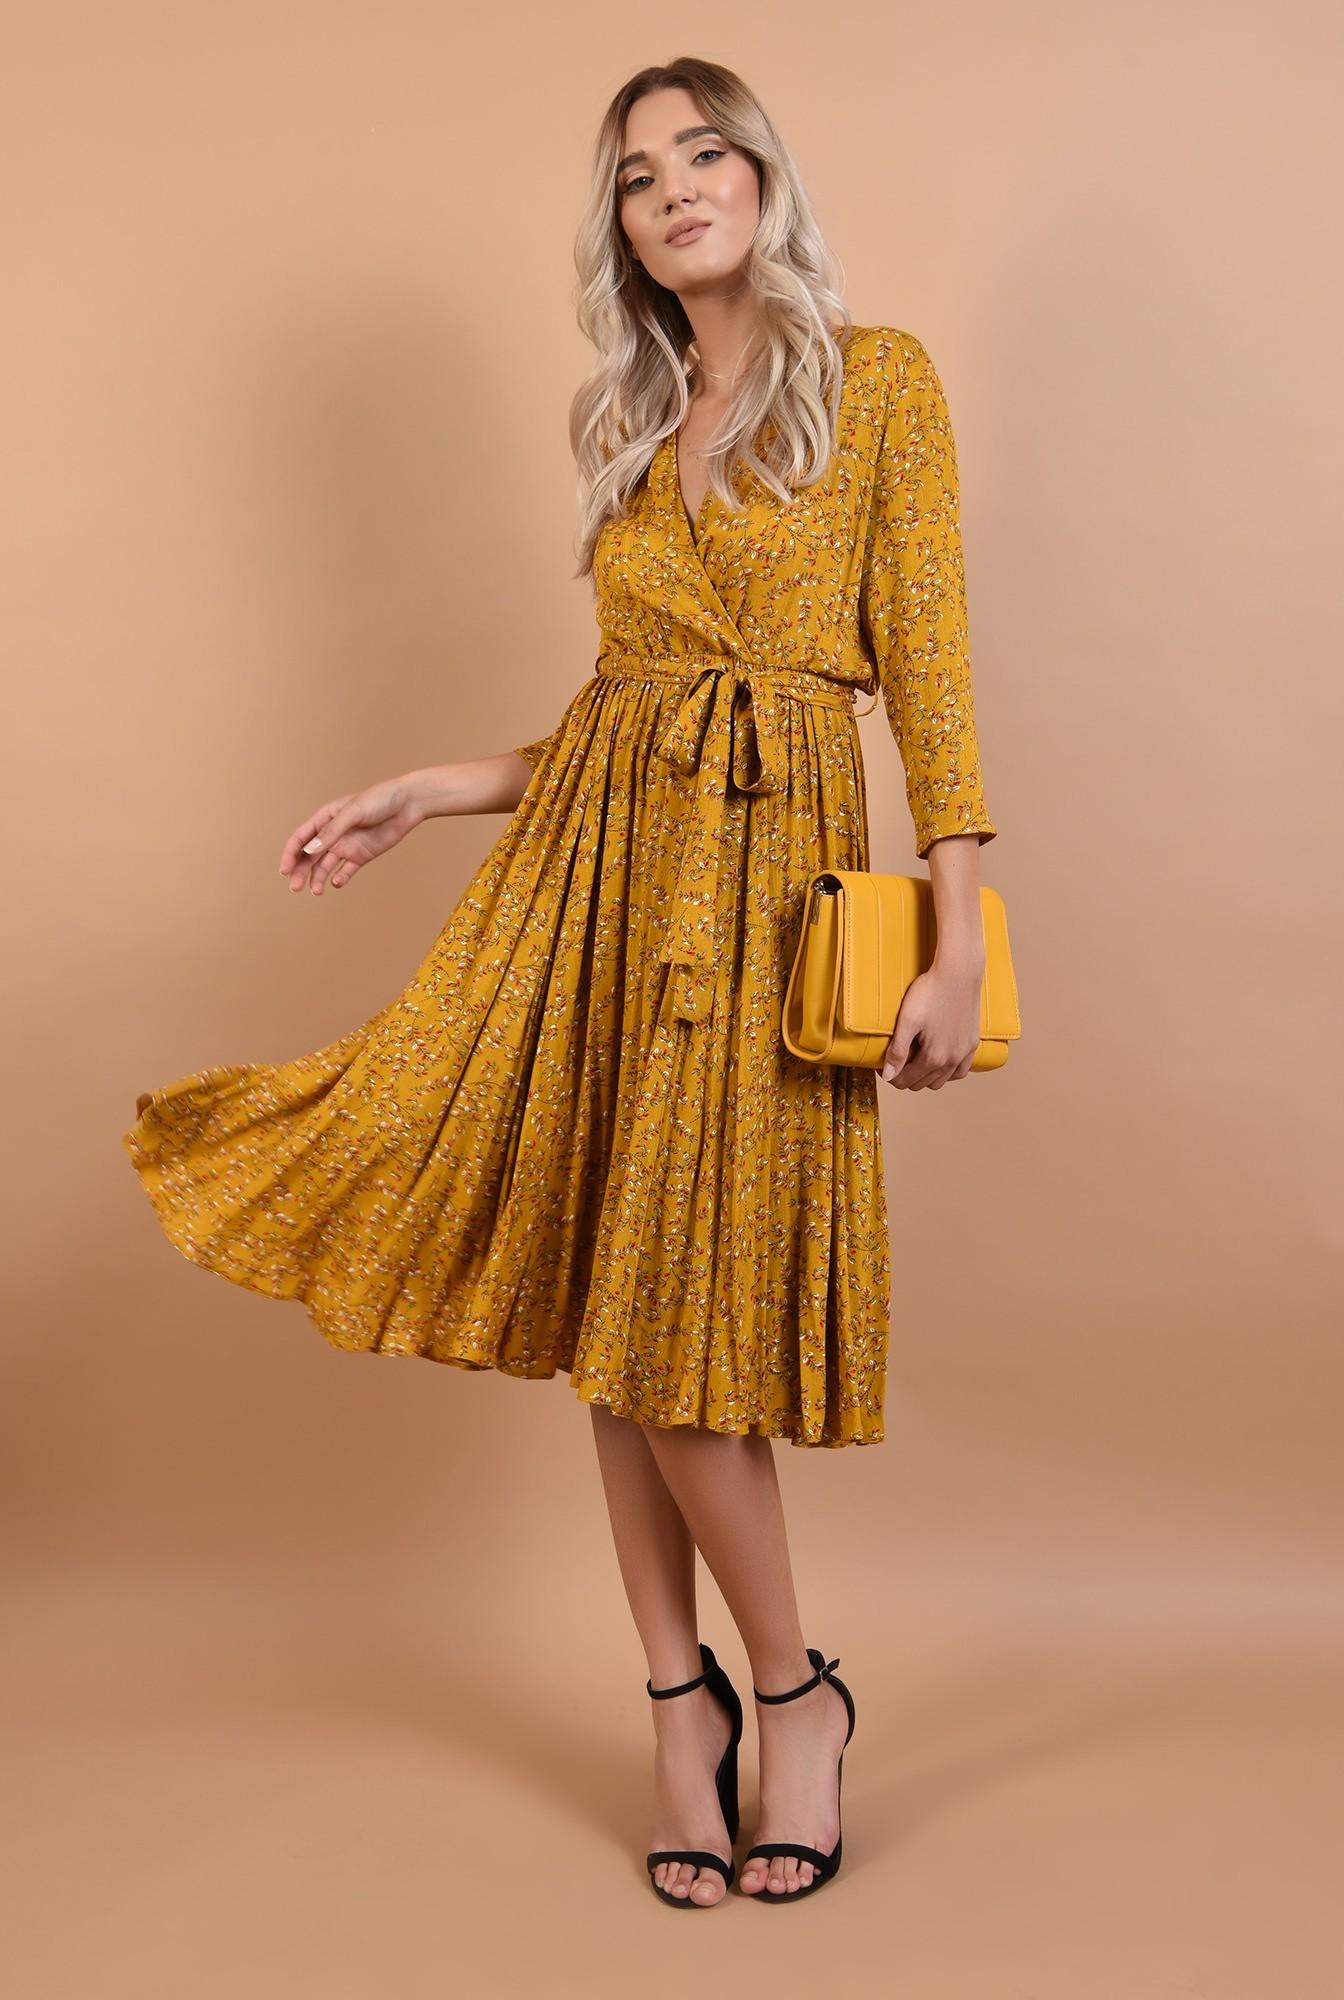 360 - rochie de toamna, imprimeu floral, mustar, cu cordon, decolteu in V